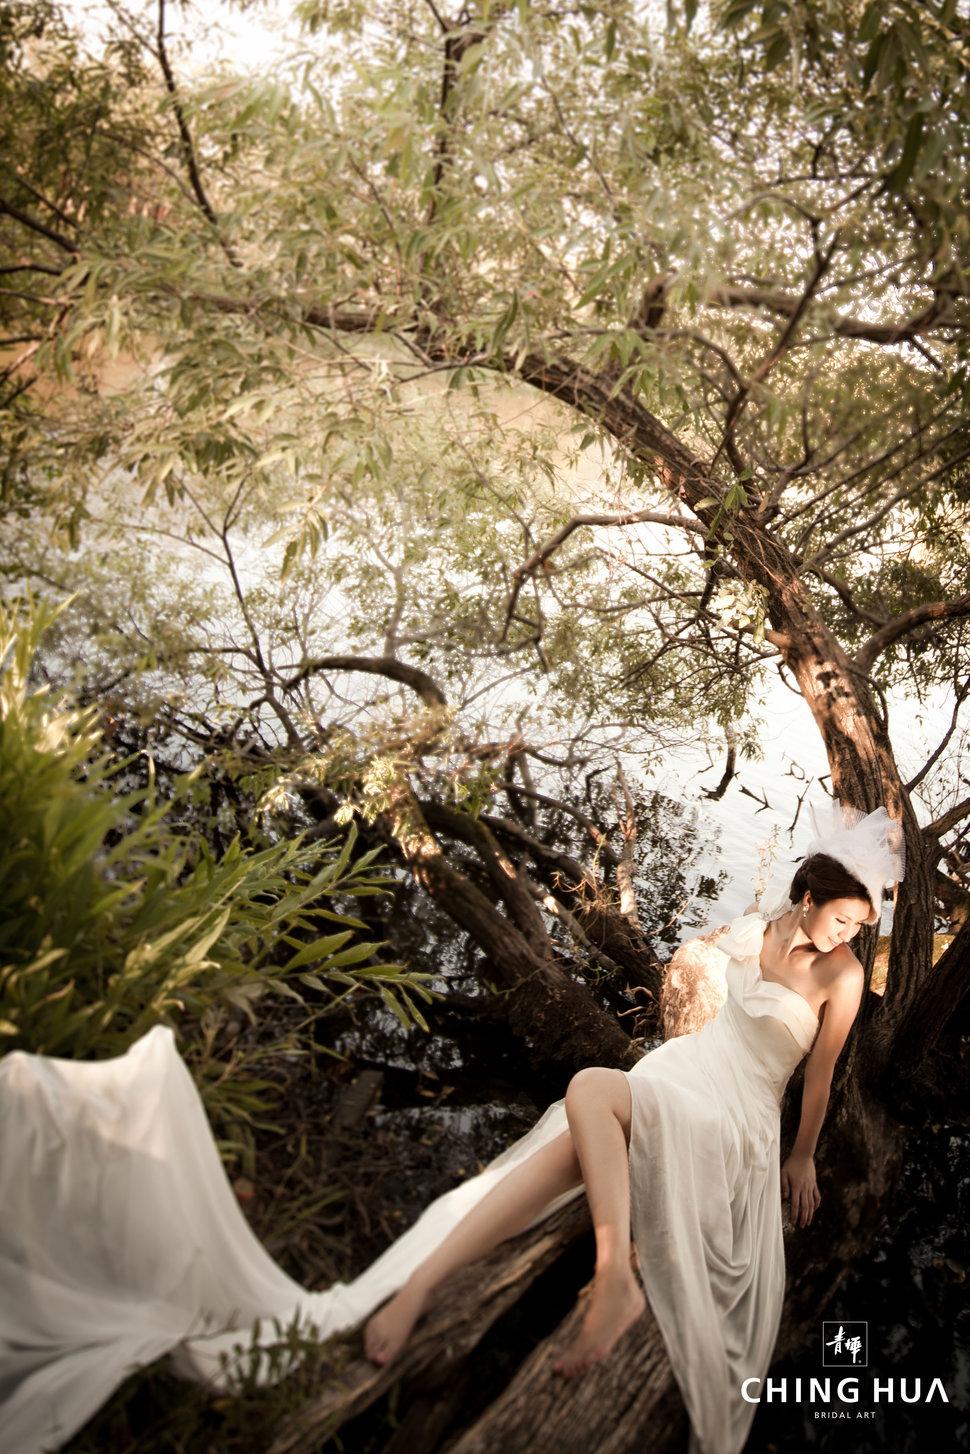 (編號:193287) - 青樺婚紗CHINGHUA - 結婚吧